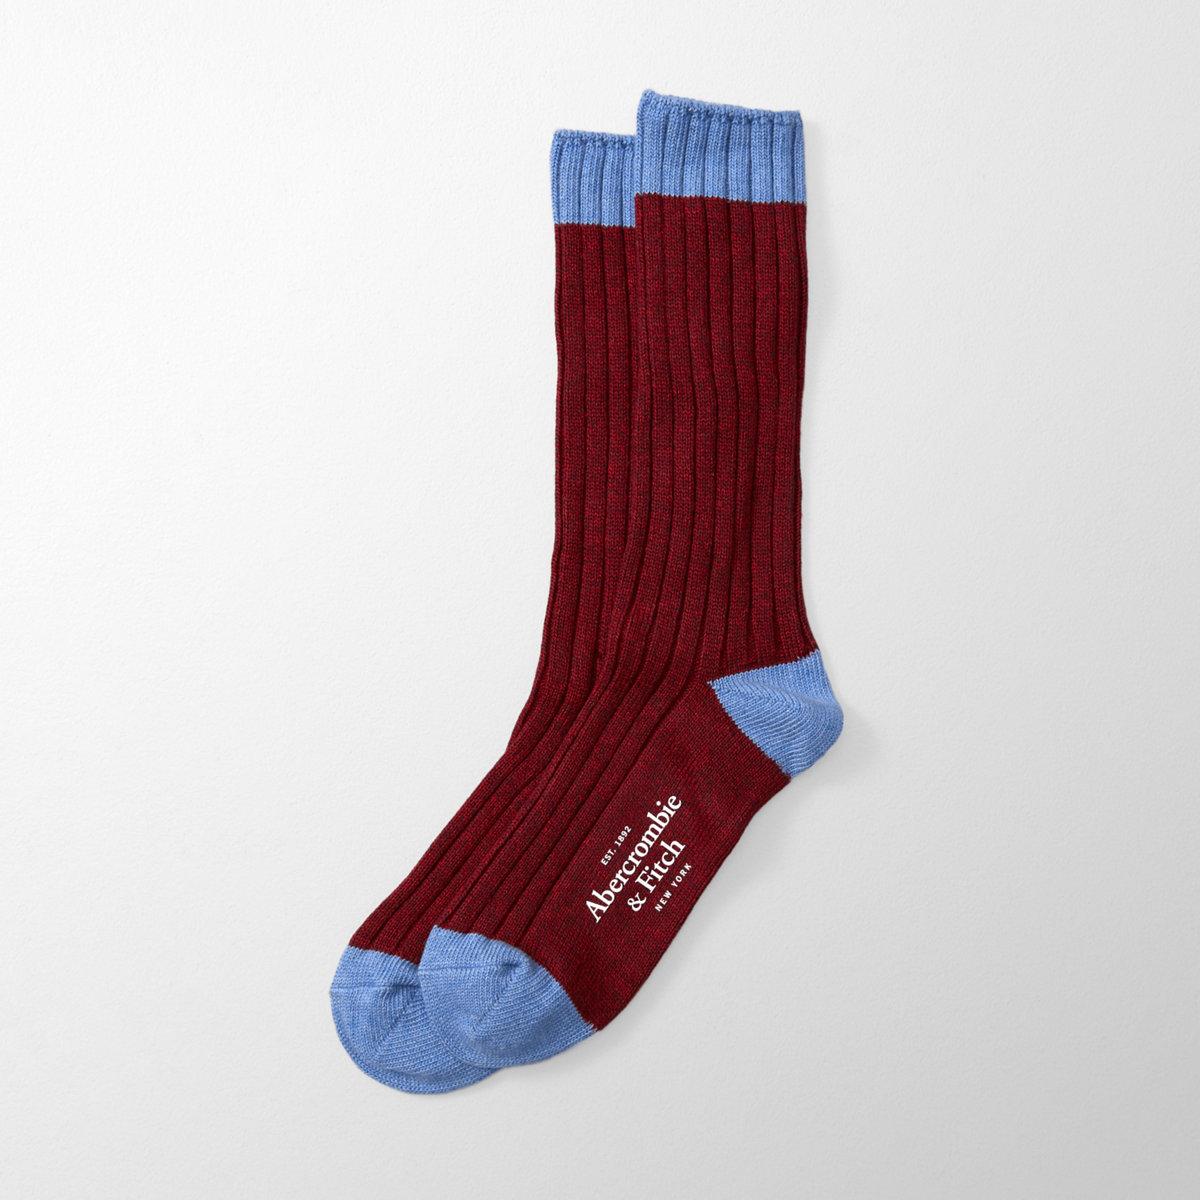 A&F Camp Socks